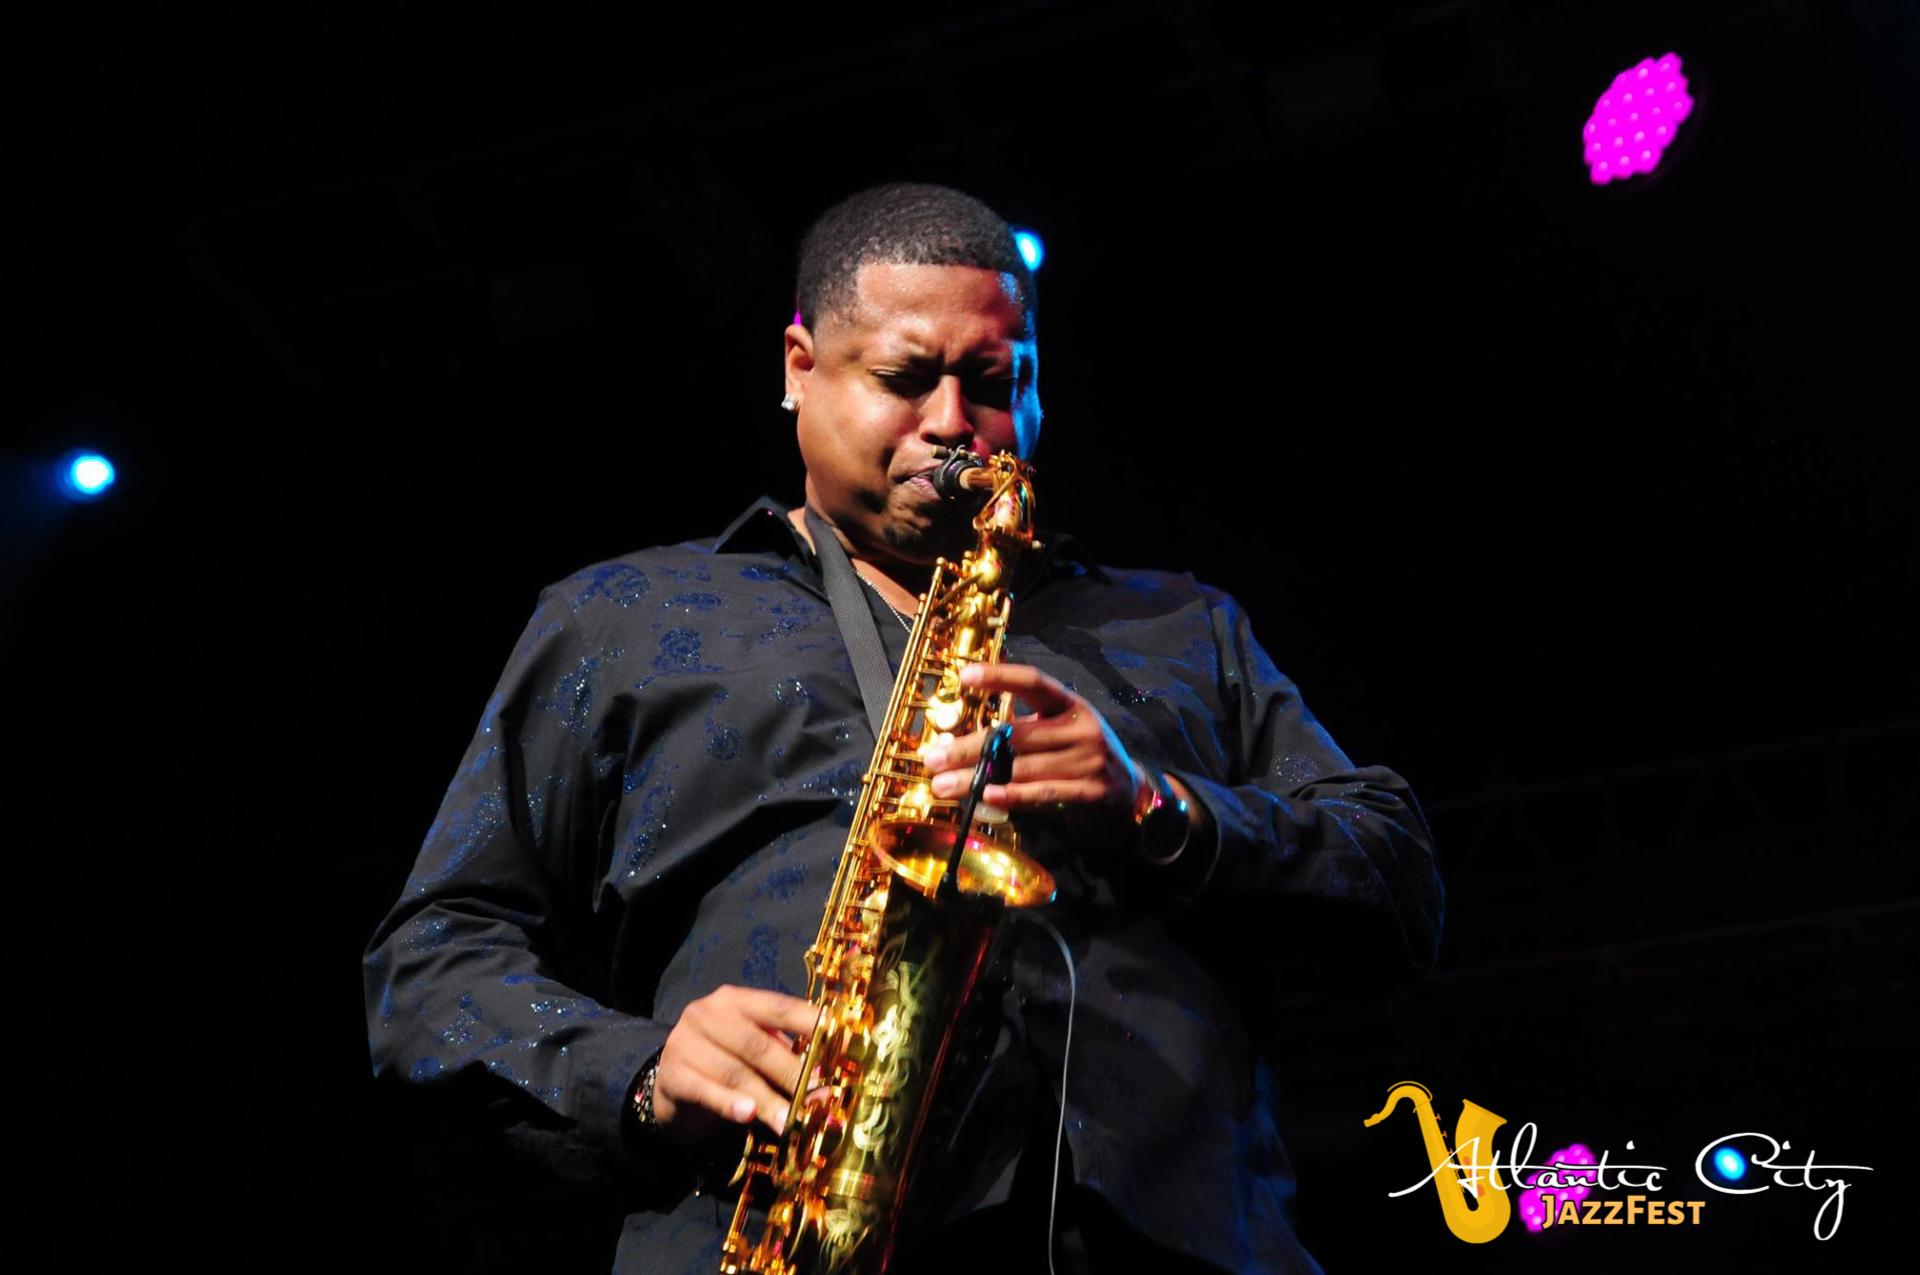 2019 Jazz Fest Picture-20